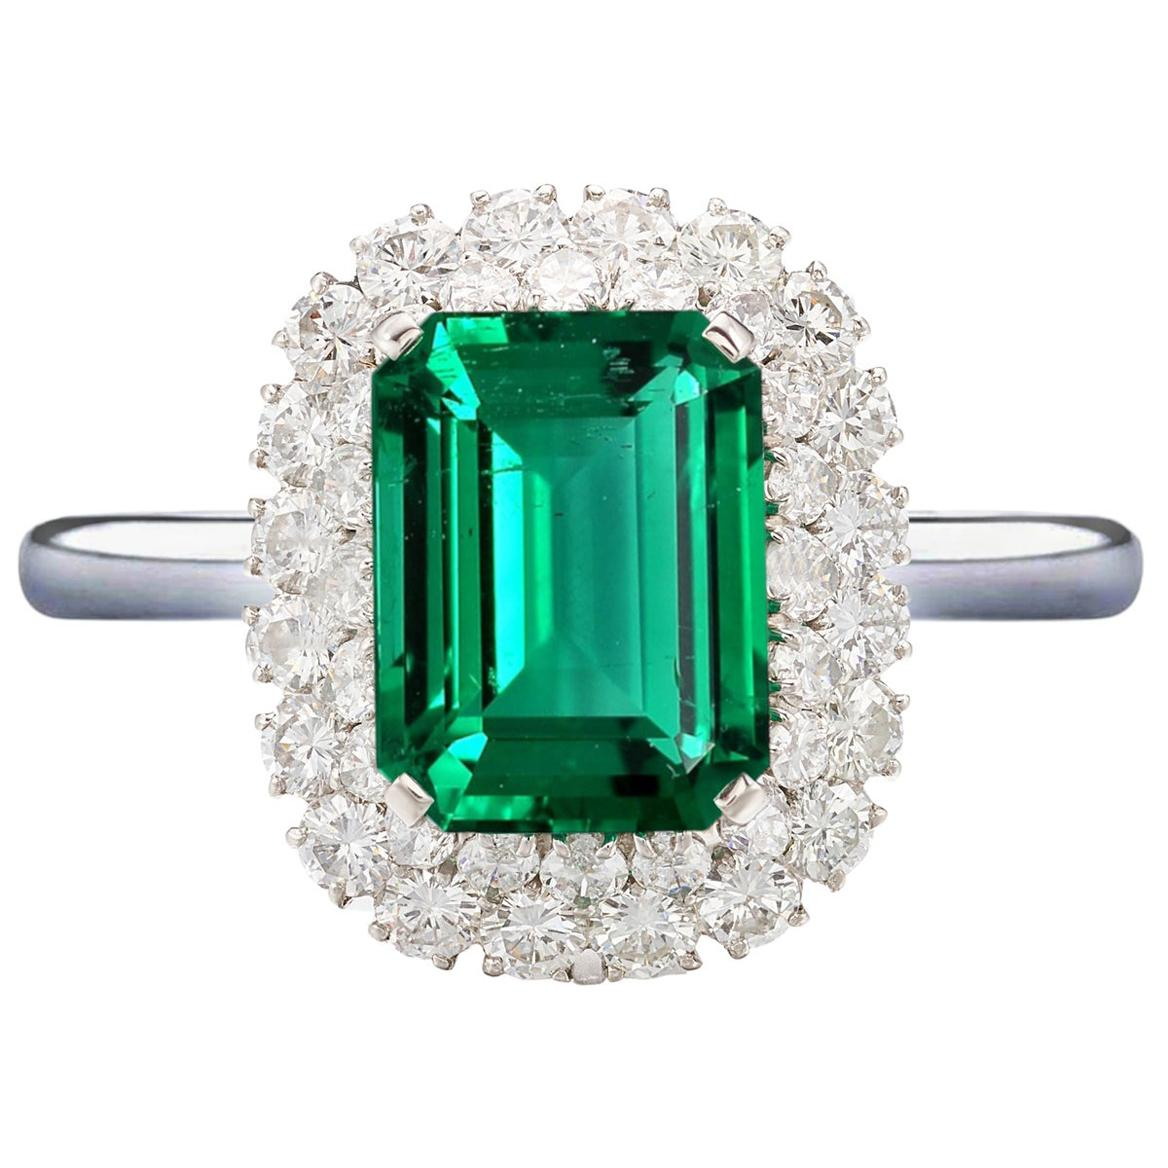 Certified 3 Carat No Oil Green Zambian Emerald Diamond Cocktail Platinum Ring